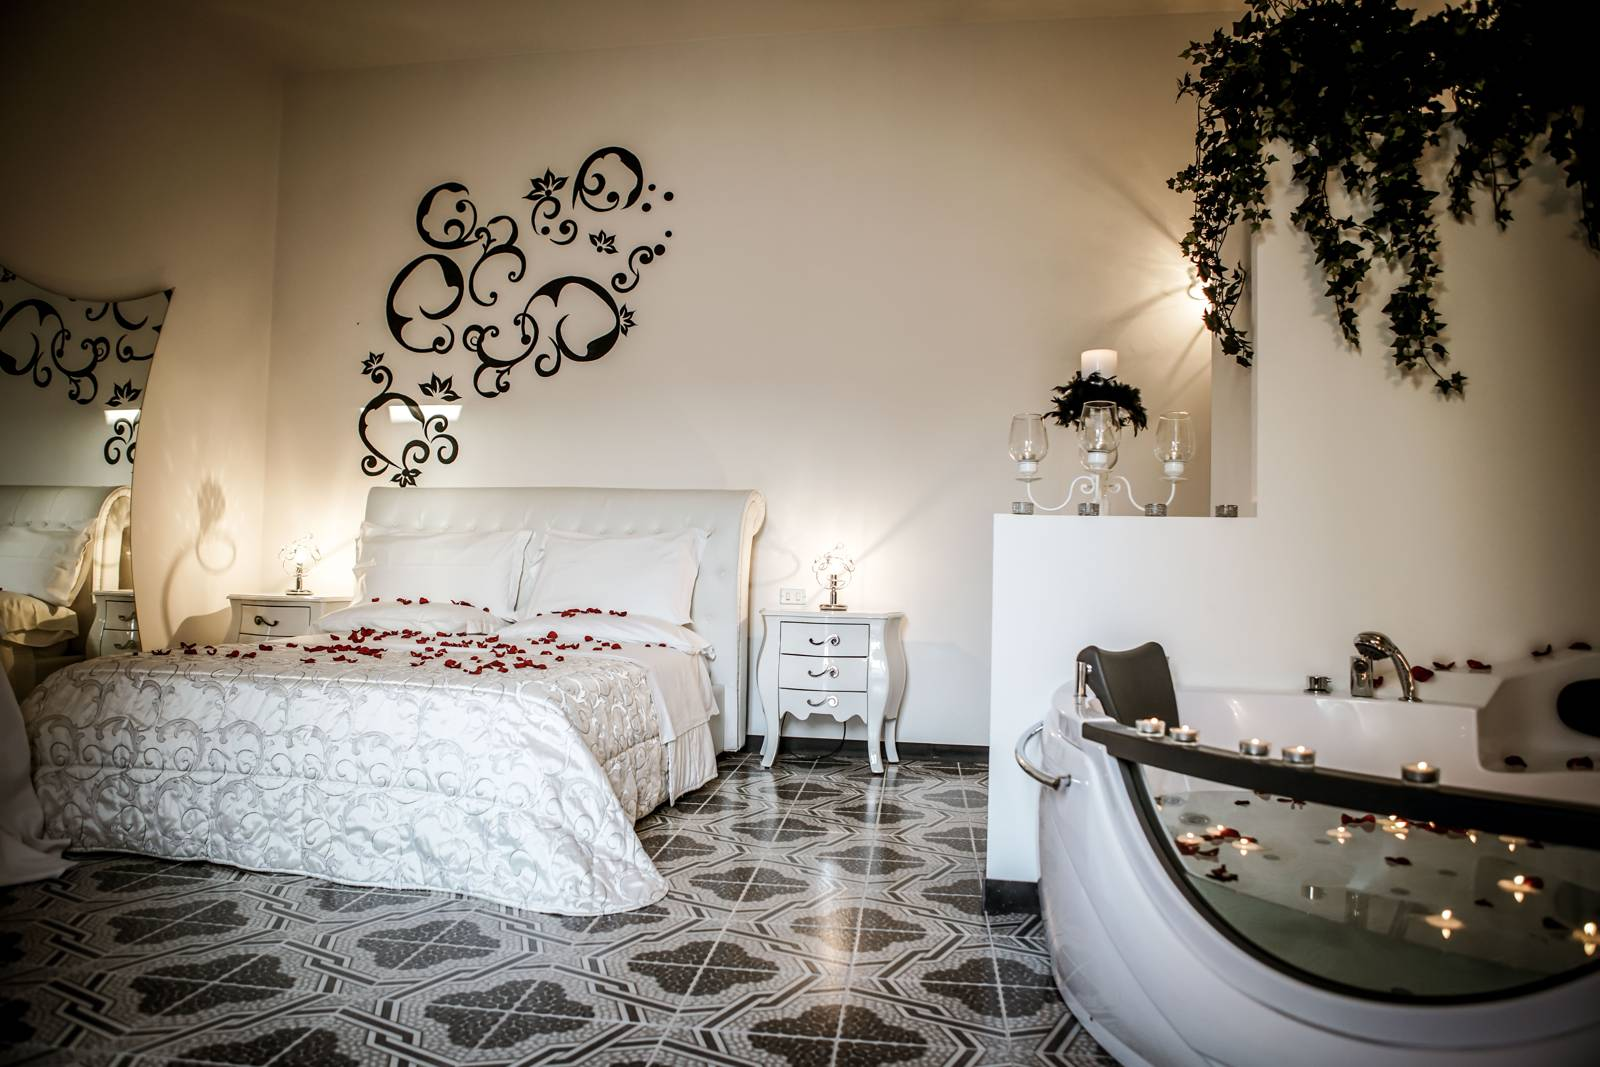 Siti web Bed and Breakfast: B&B Il Sogno di Pandora - Maingage, Web agency Bari